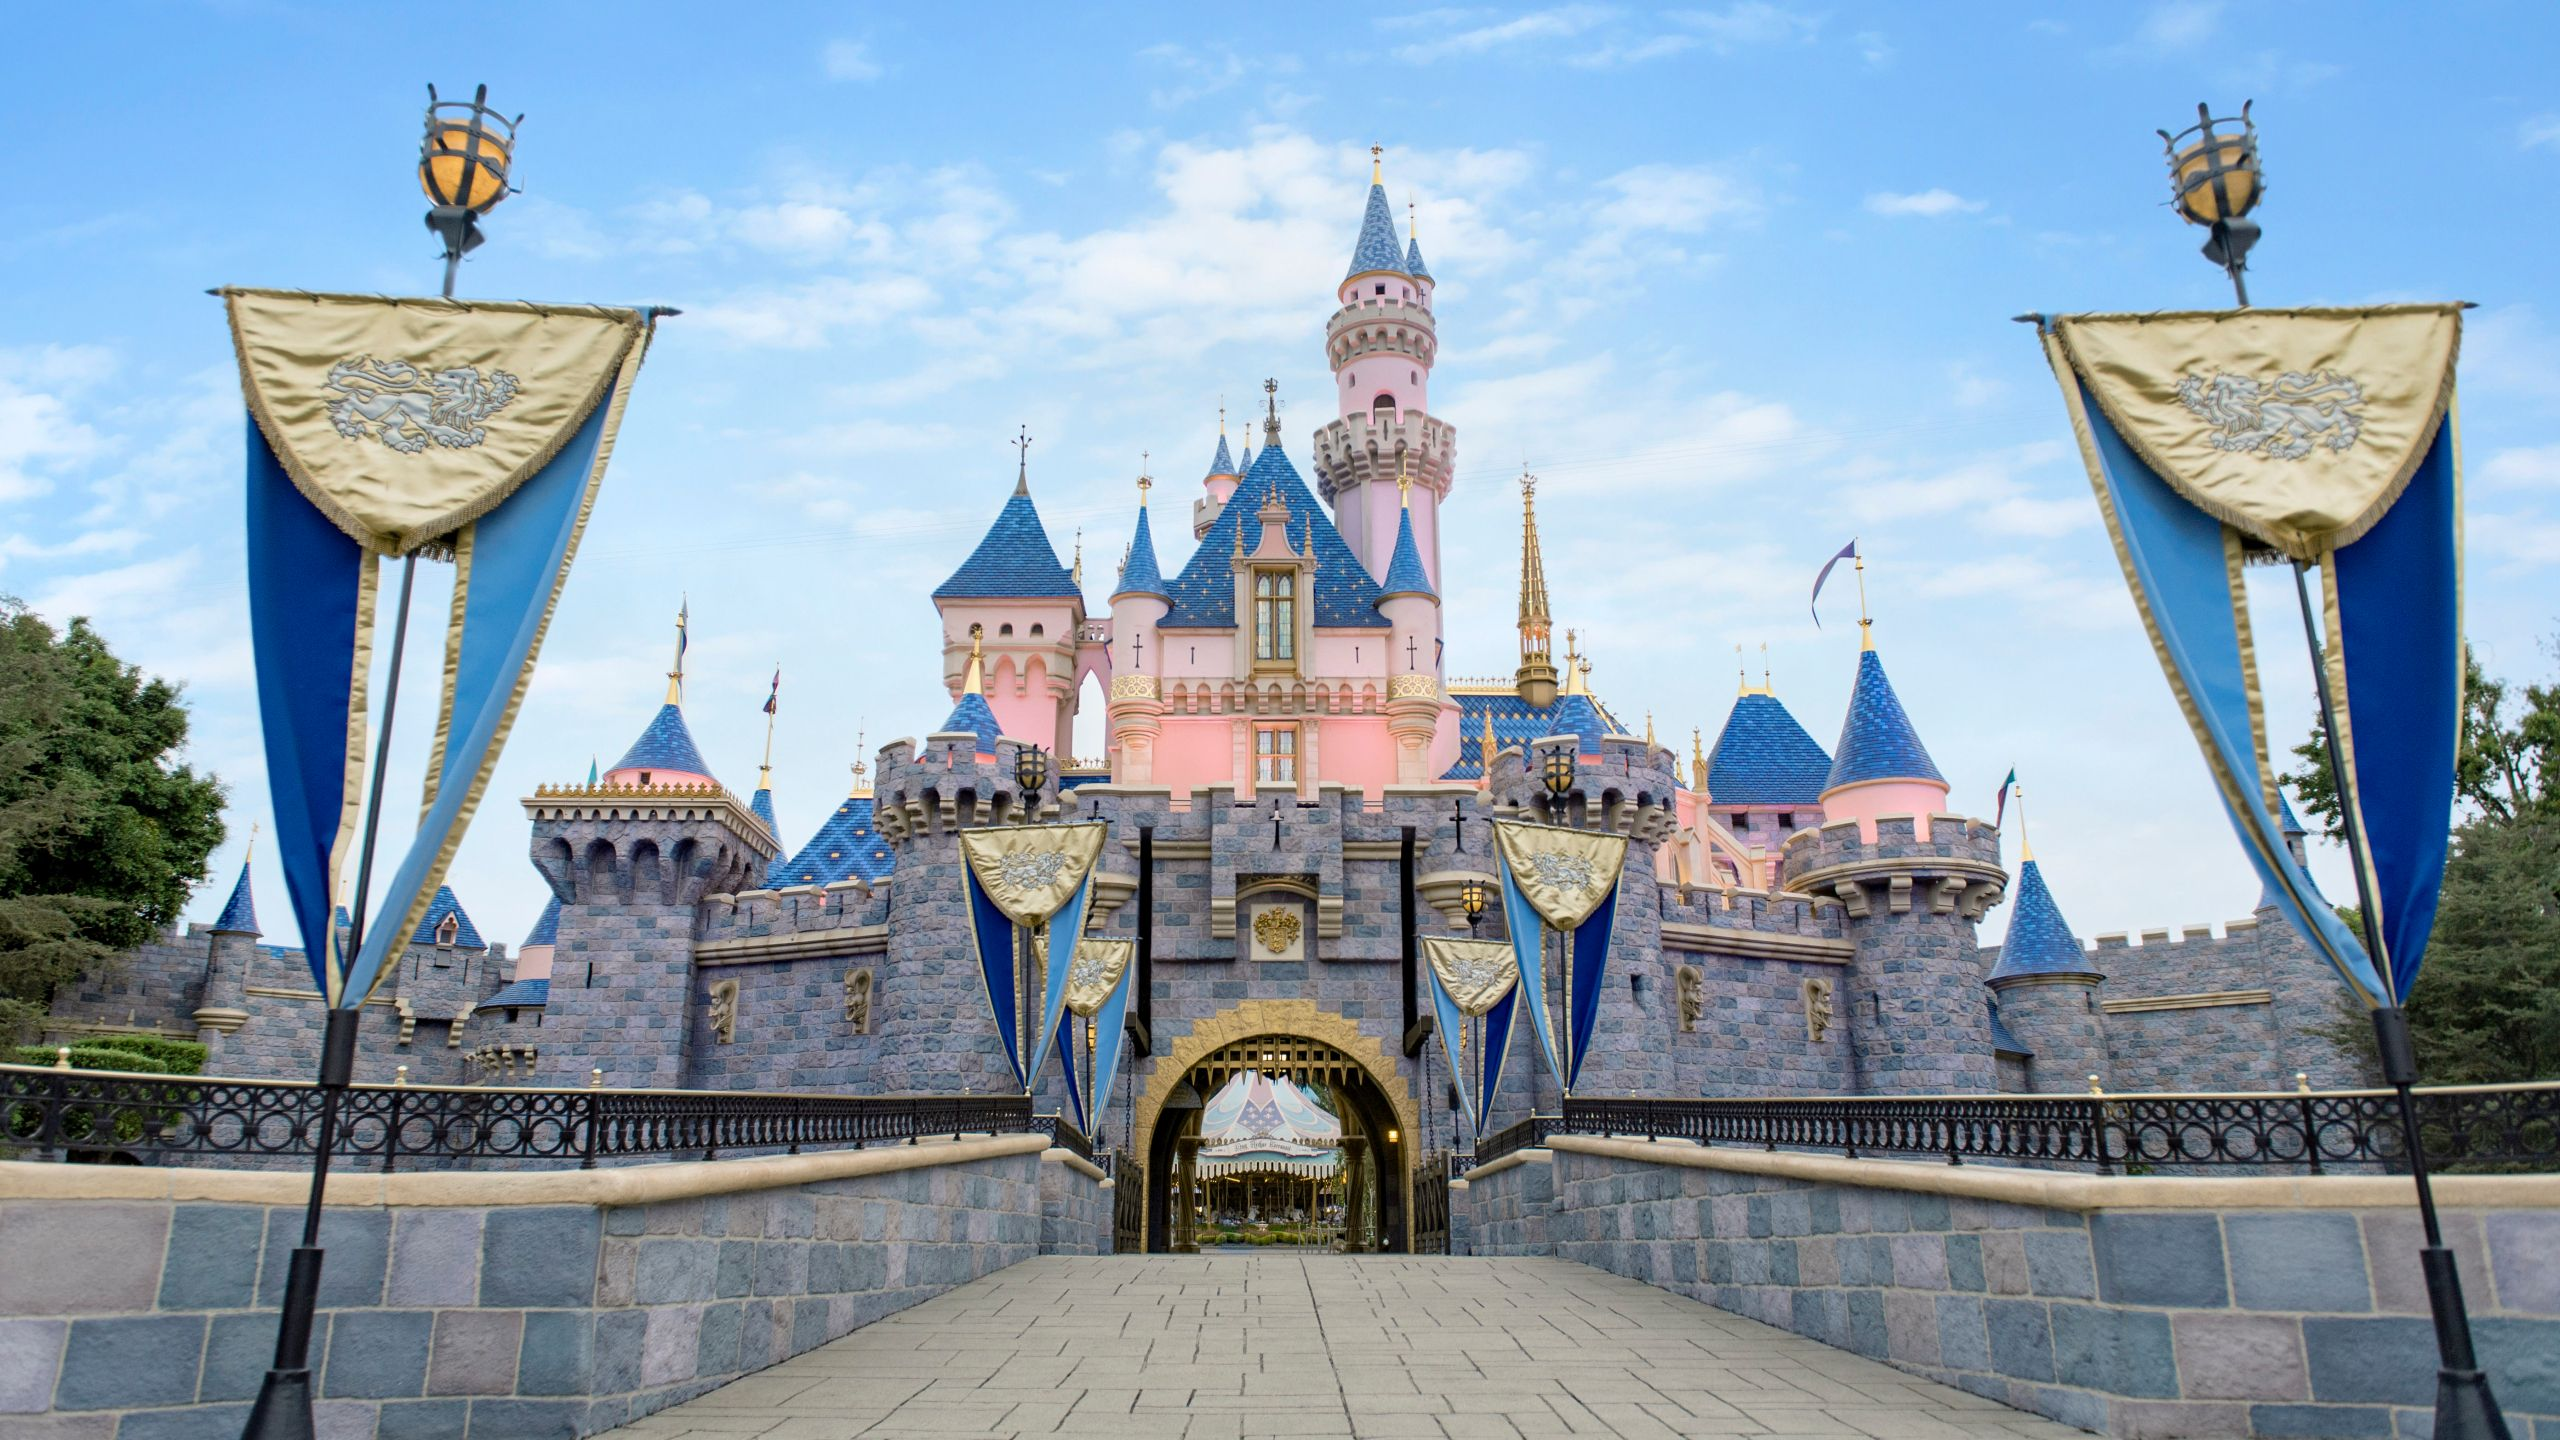 Sleeping Beauty Castle at Disneyland is seen in this photo distributed on Aug. 3, 2021. (Disneyland Resort)